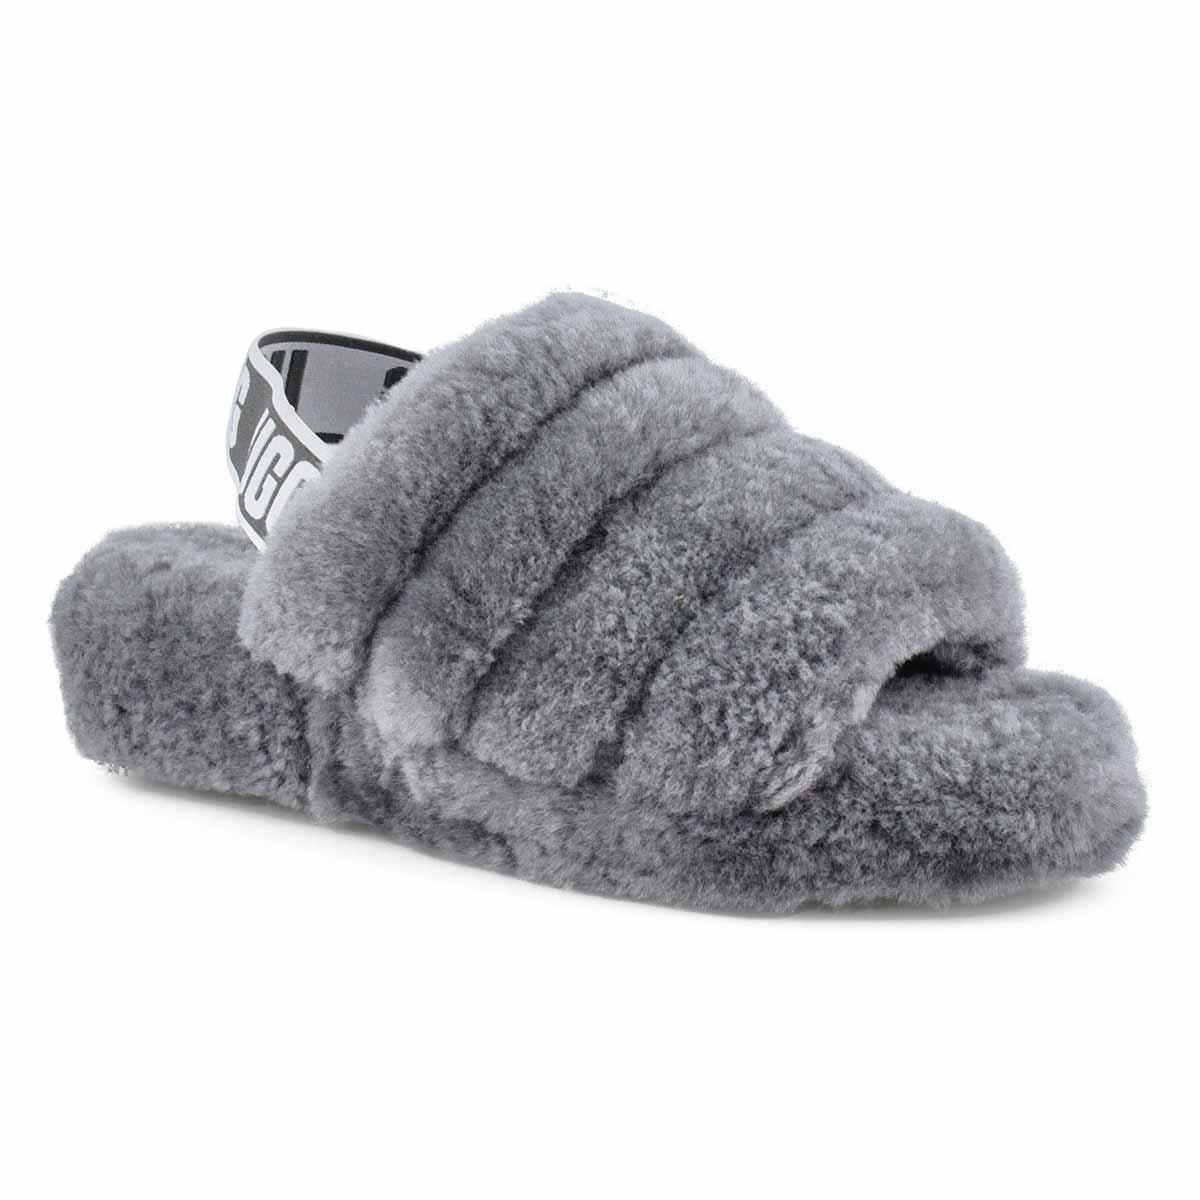 96cc3f4a635 Women's FLUFF YEAH charcoal sheepskin slippers